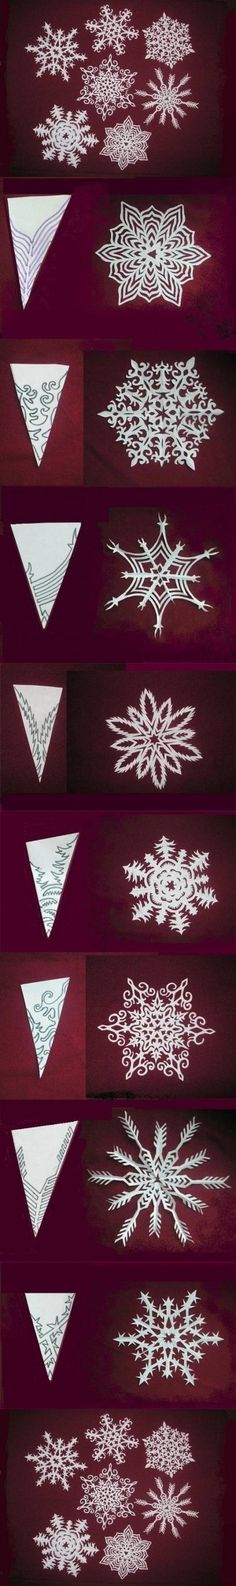 DIY Snowflakes Paper Pattern Tutorial DIY Projects